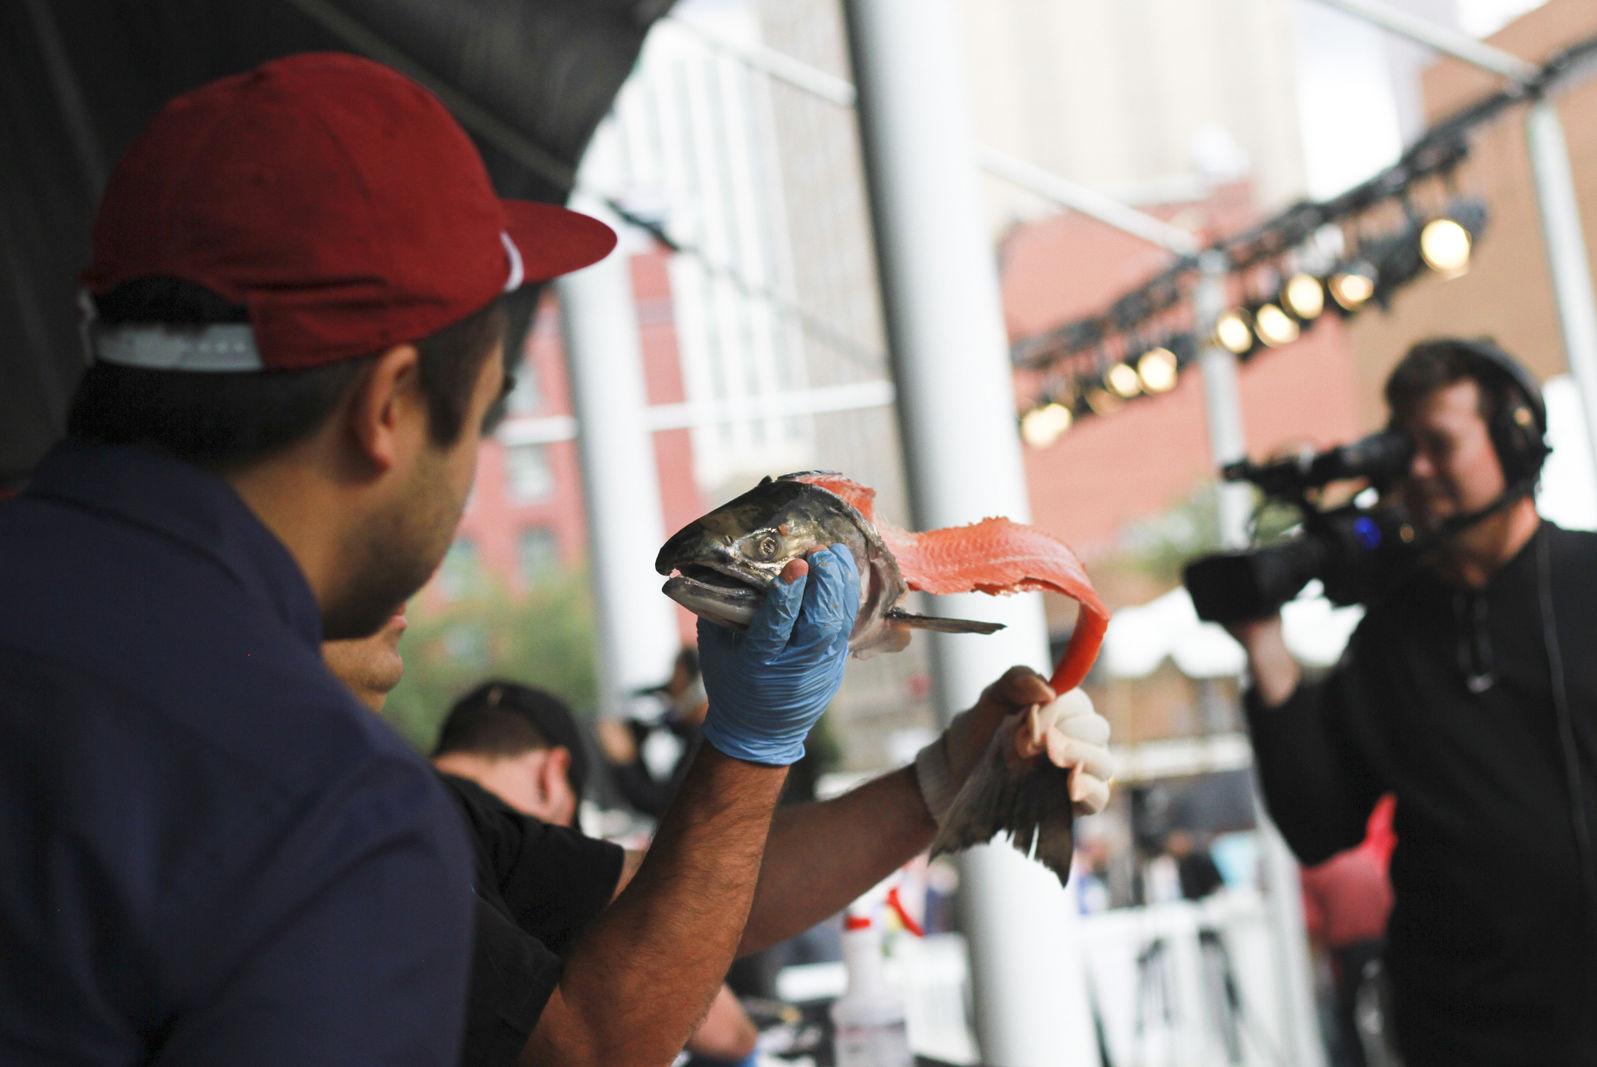 9 13 feast portland fishmonger butcher 5 mxftdm